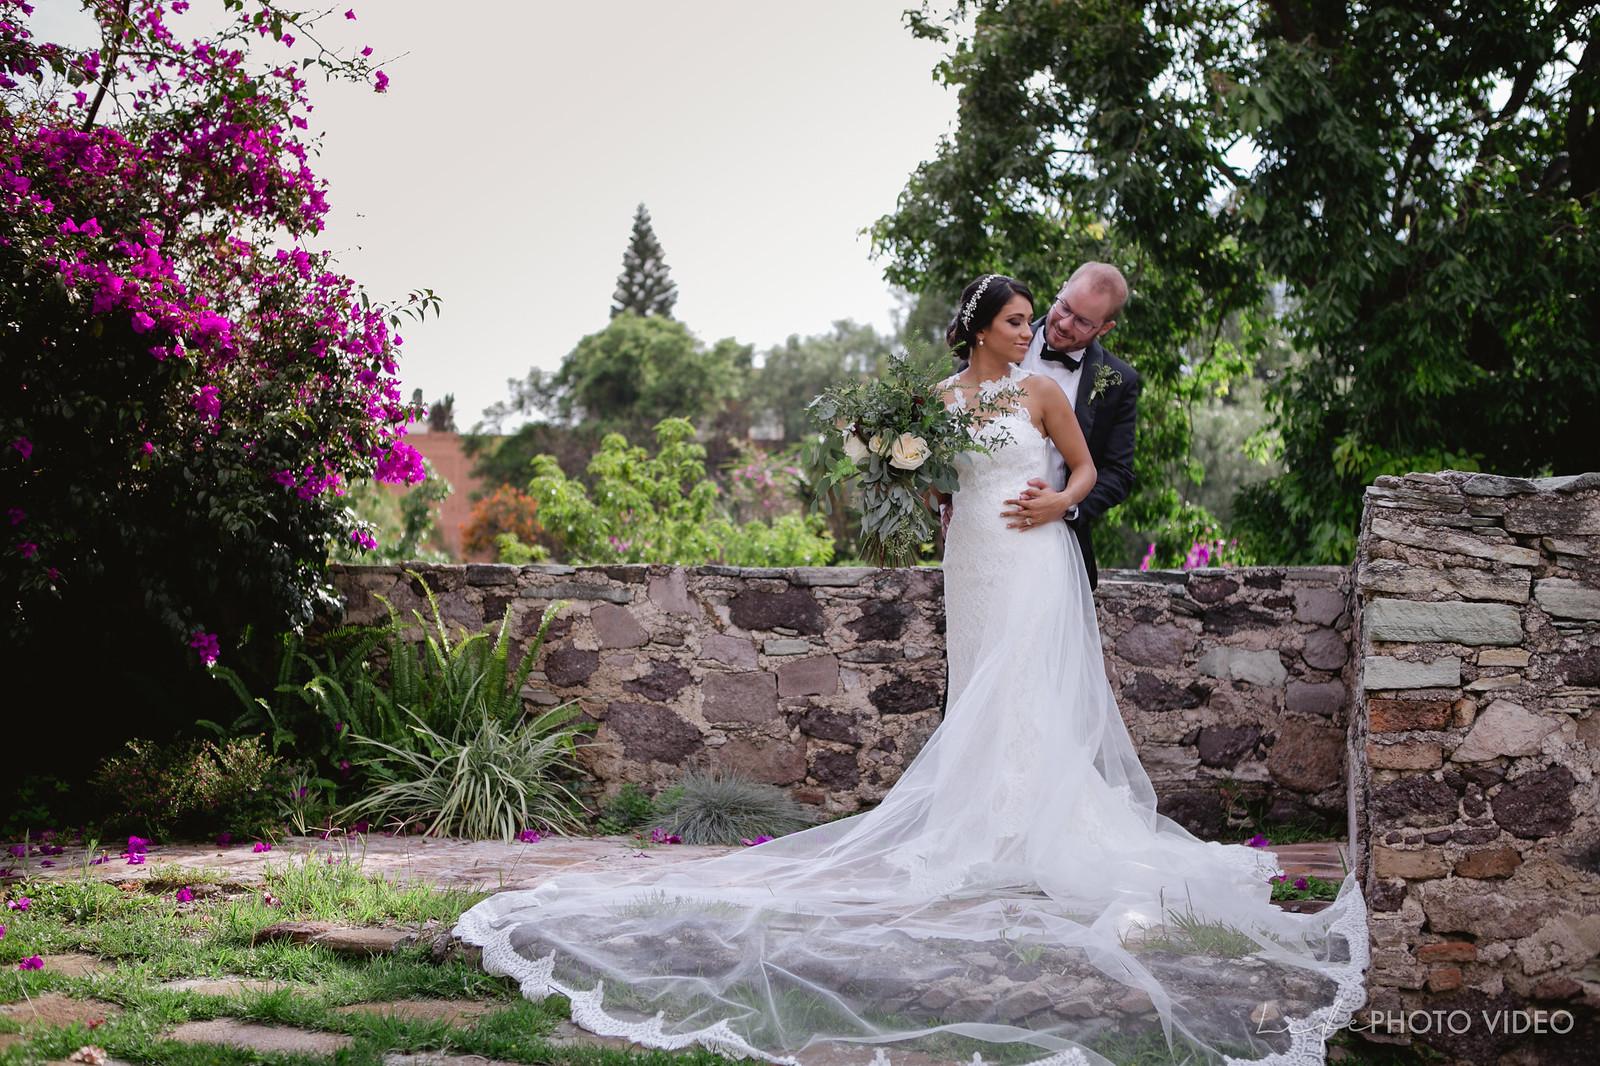 LifePhotoVideo_Boda_Guanajuato_Wedding_0021